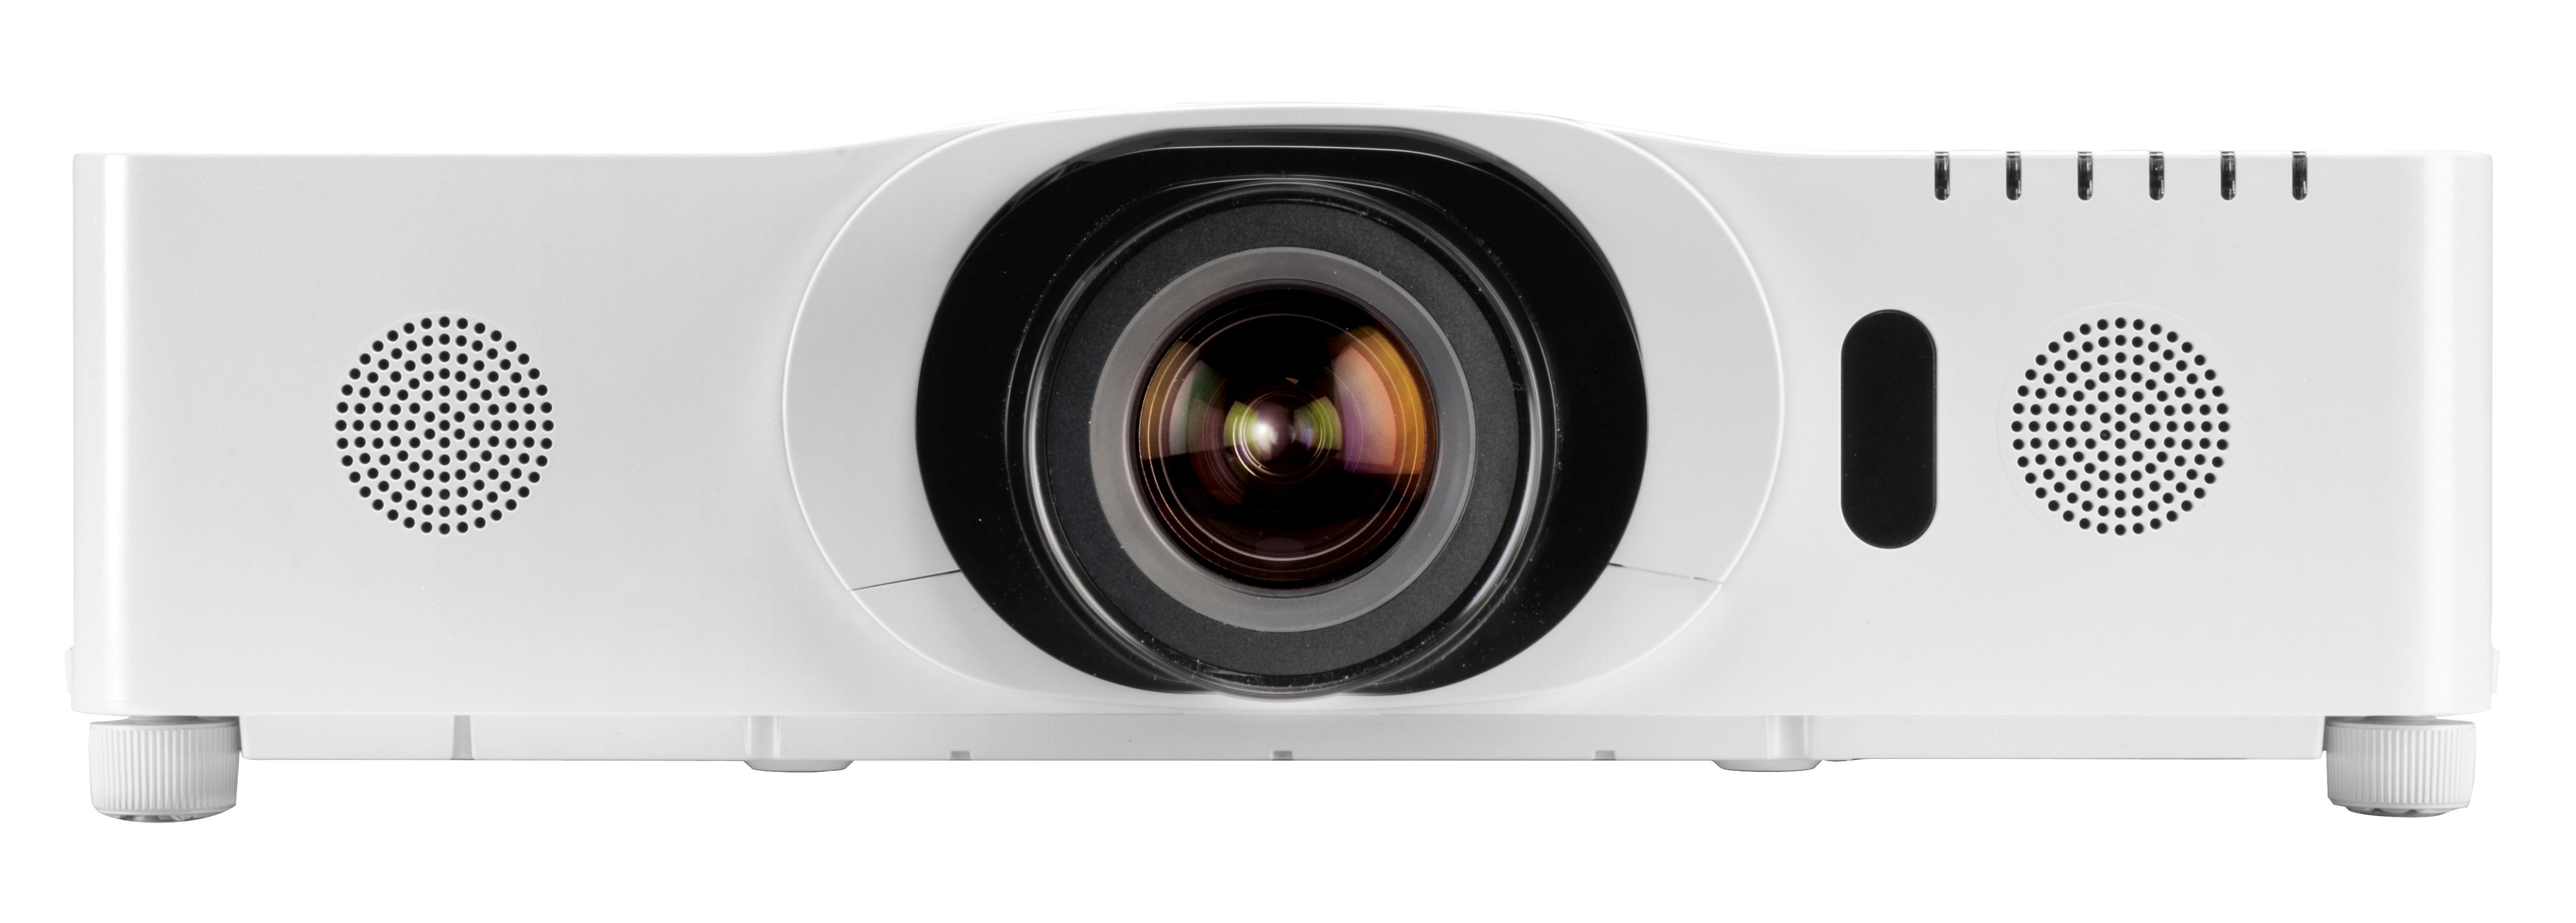 Hitachi Projektoren Cp Wu8440 Wuxg Lcd Beamer X4041wn Wifi Projector Projektor